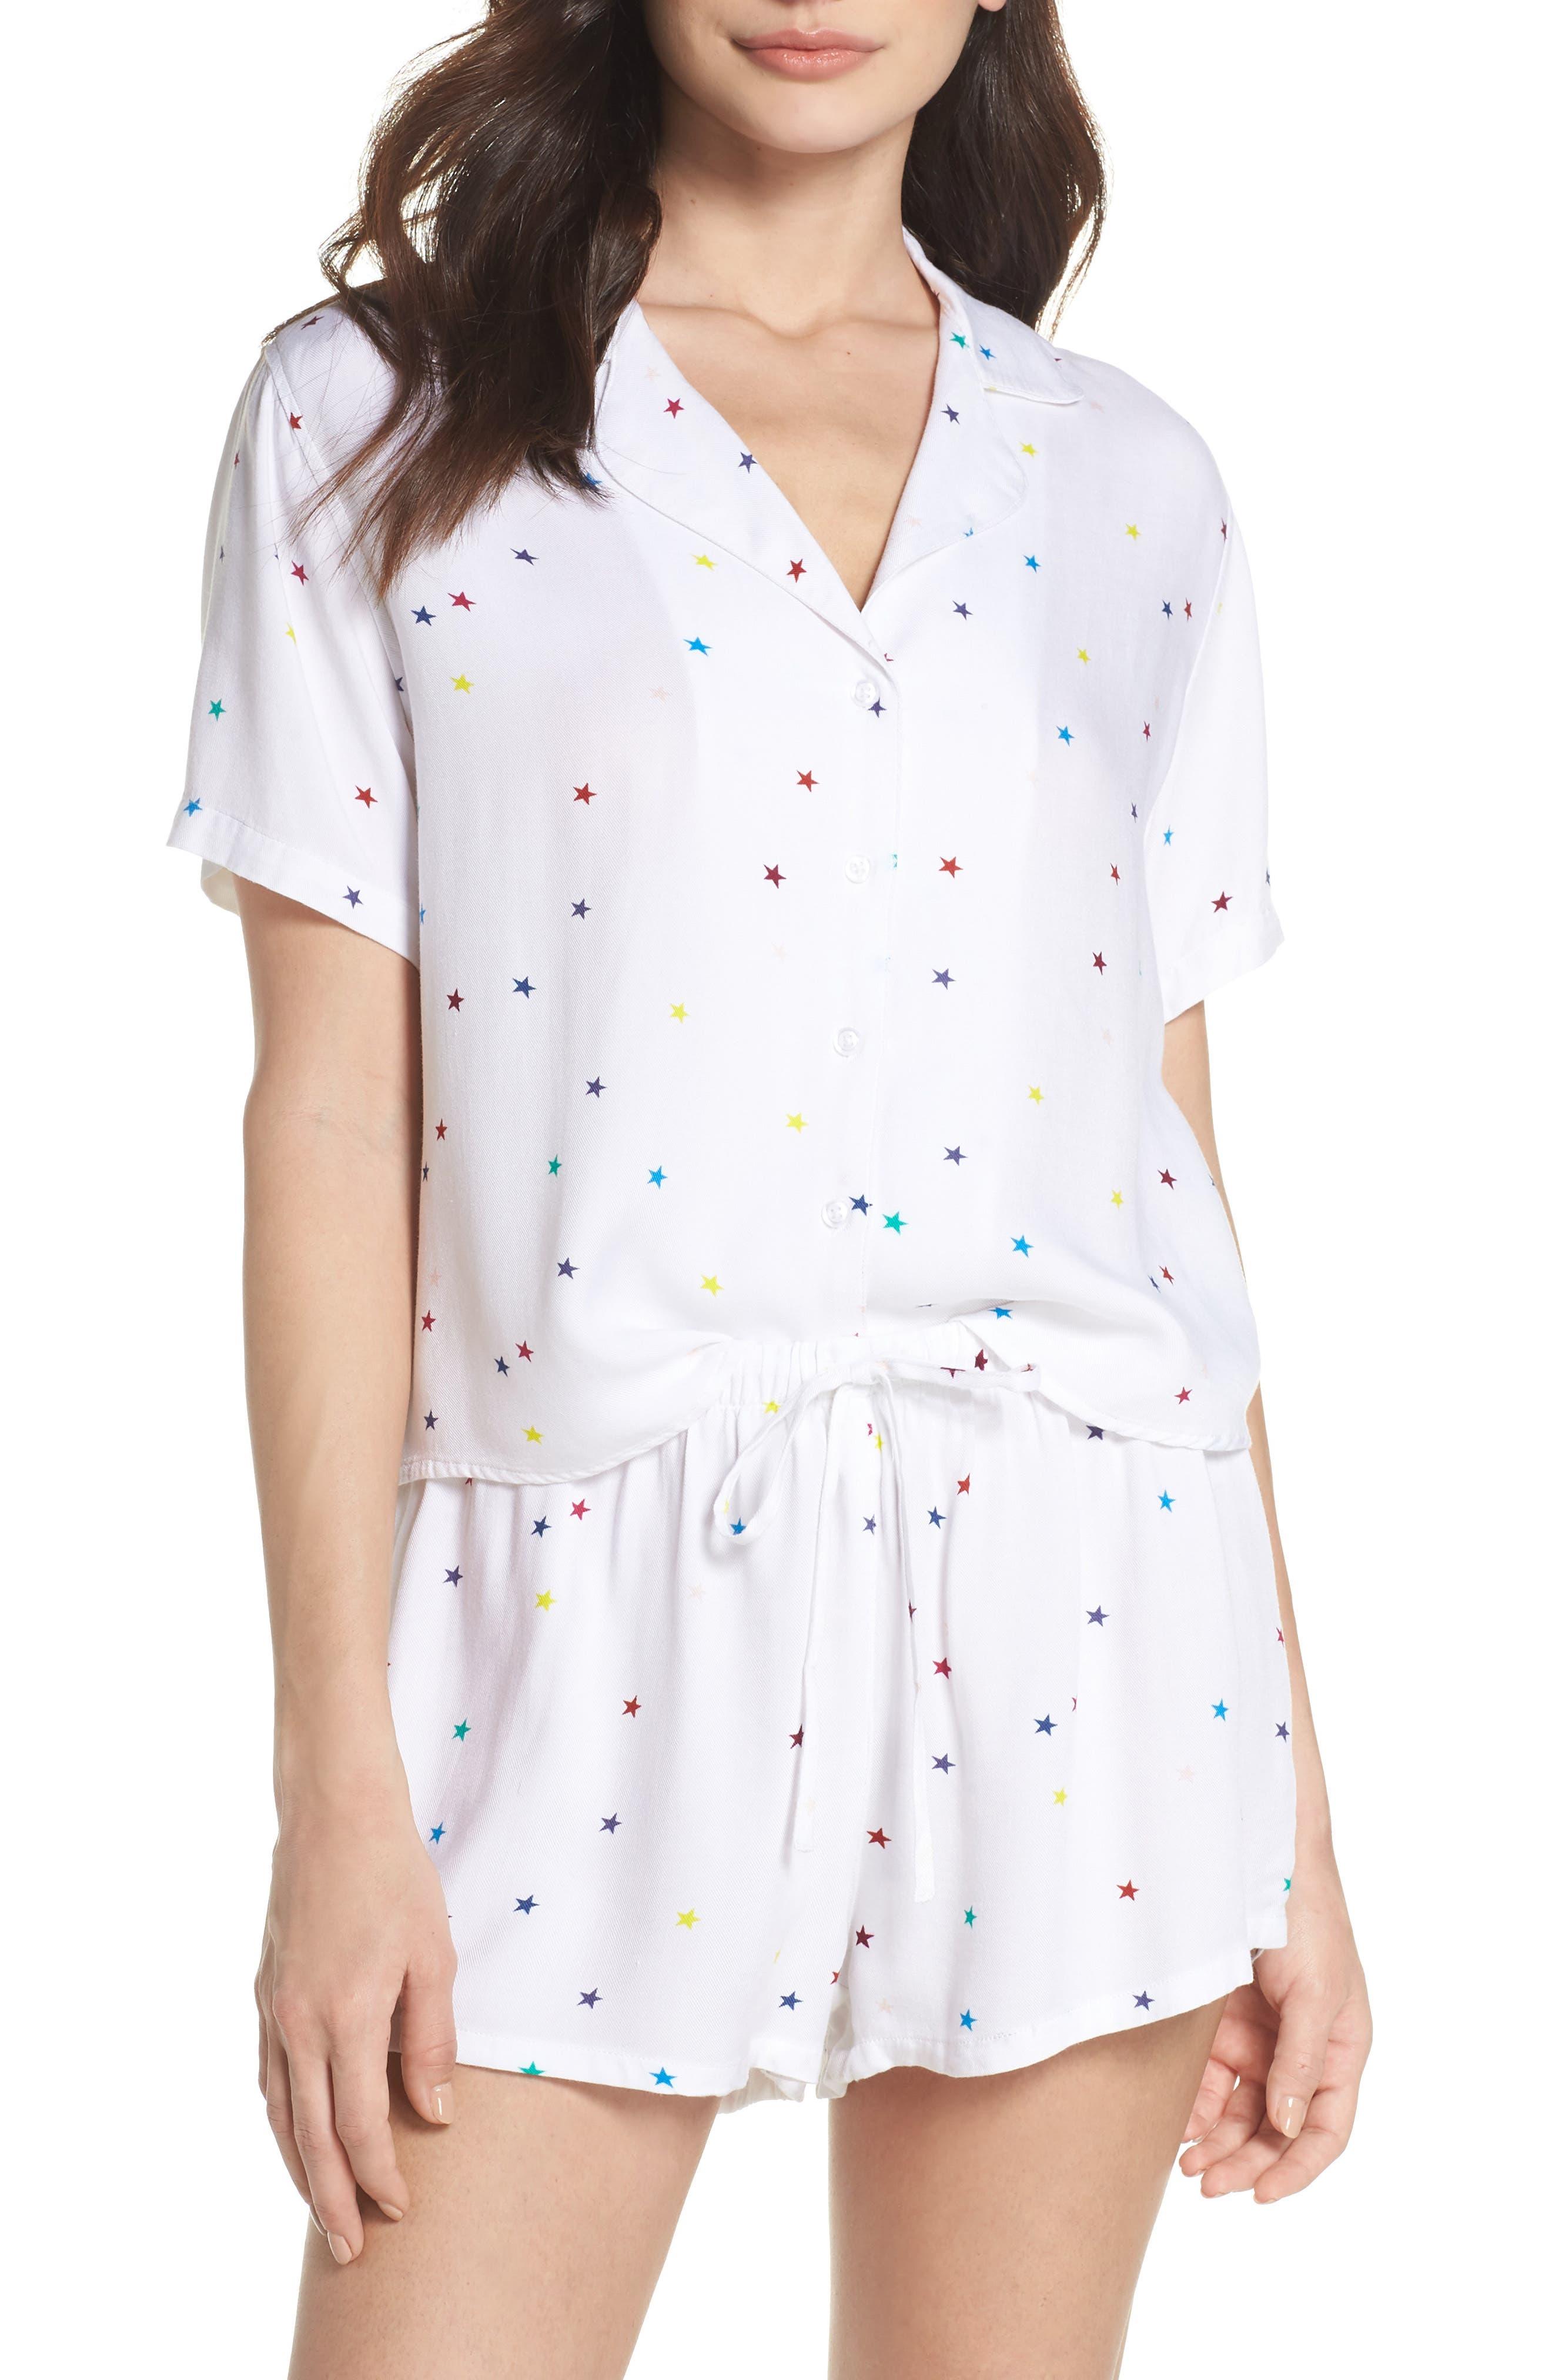 Star Print Short Pajamas,                             Main thumbnail 1, color,                             Rainbow Stars On White